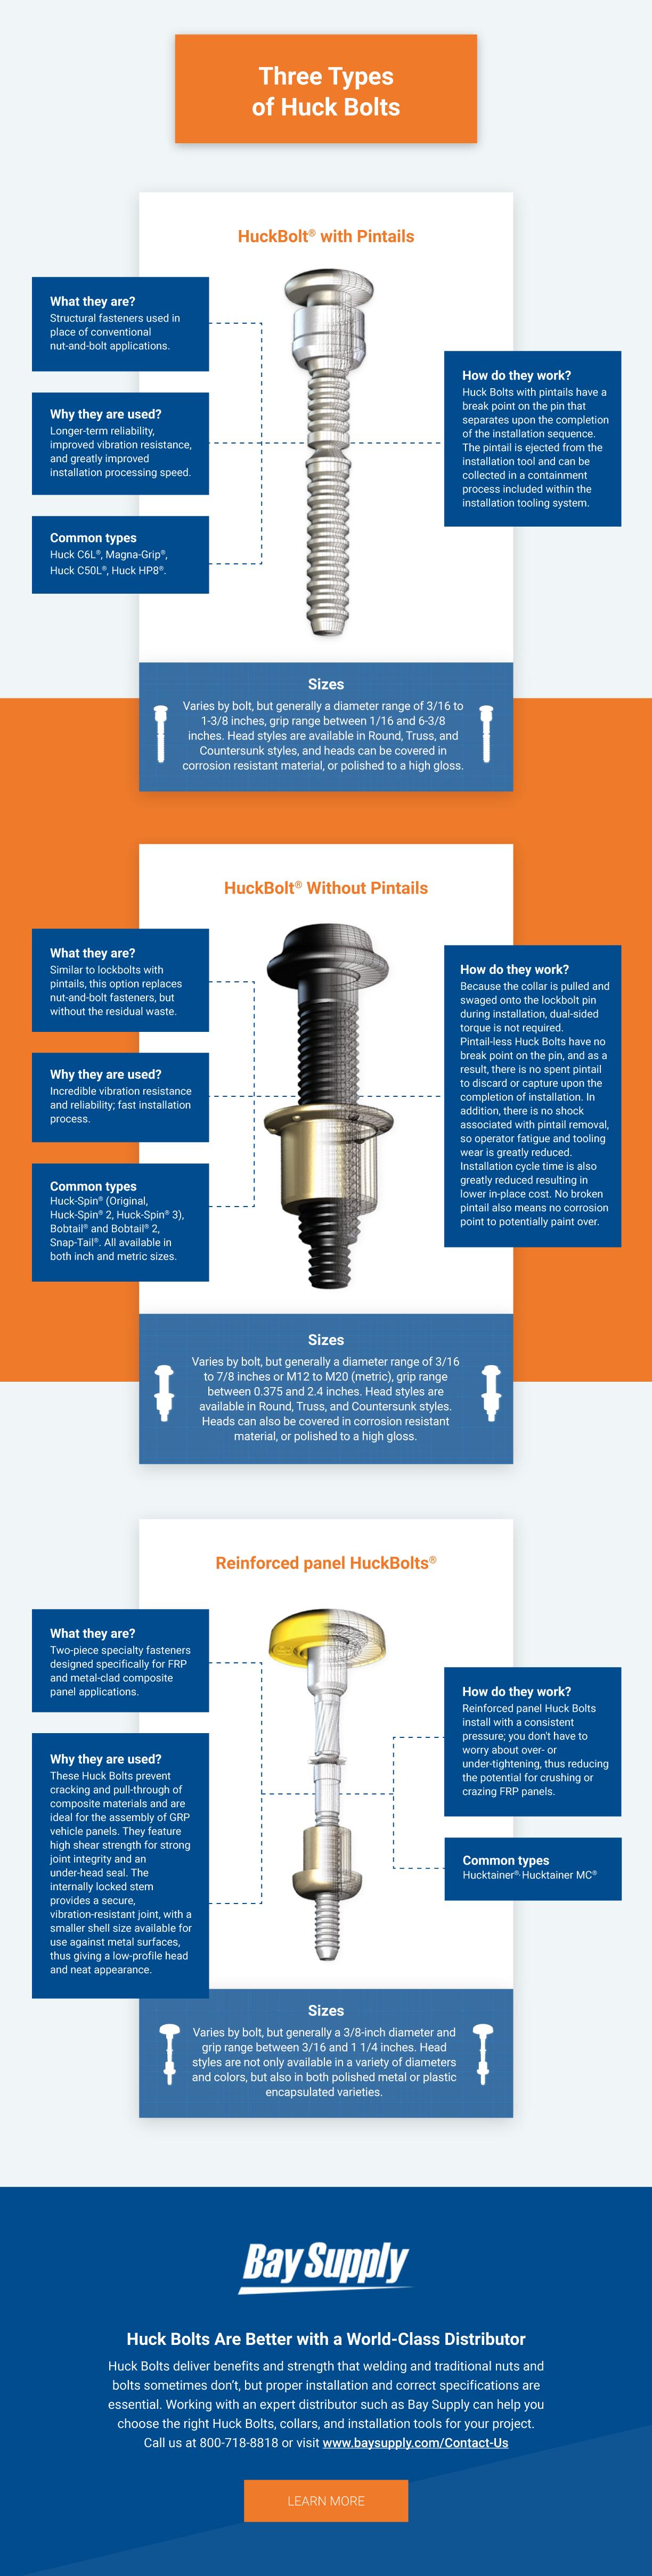 Huckbolt infographic